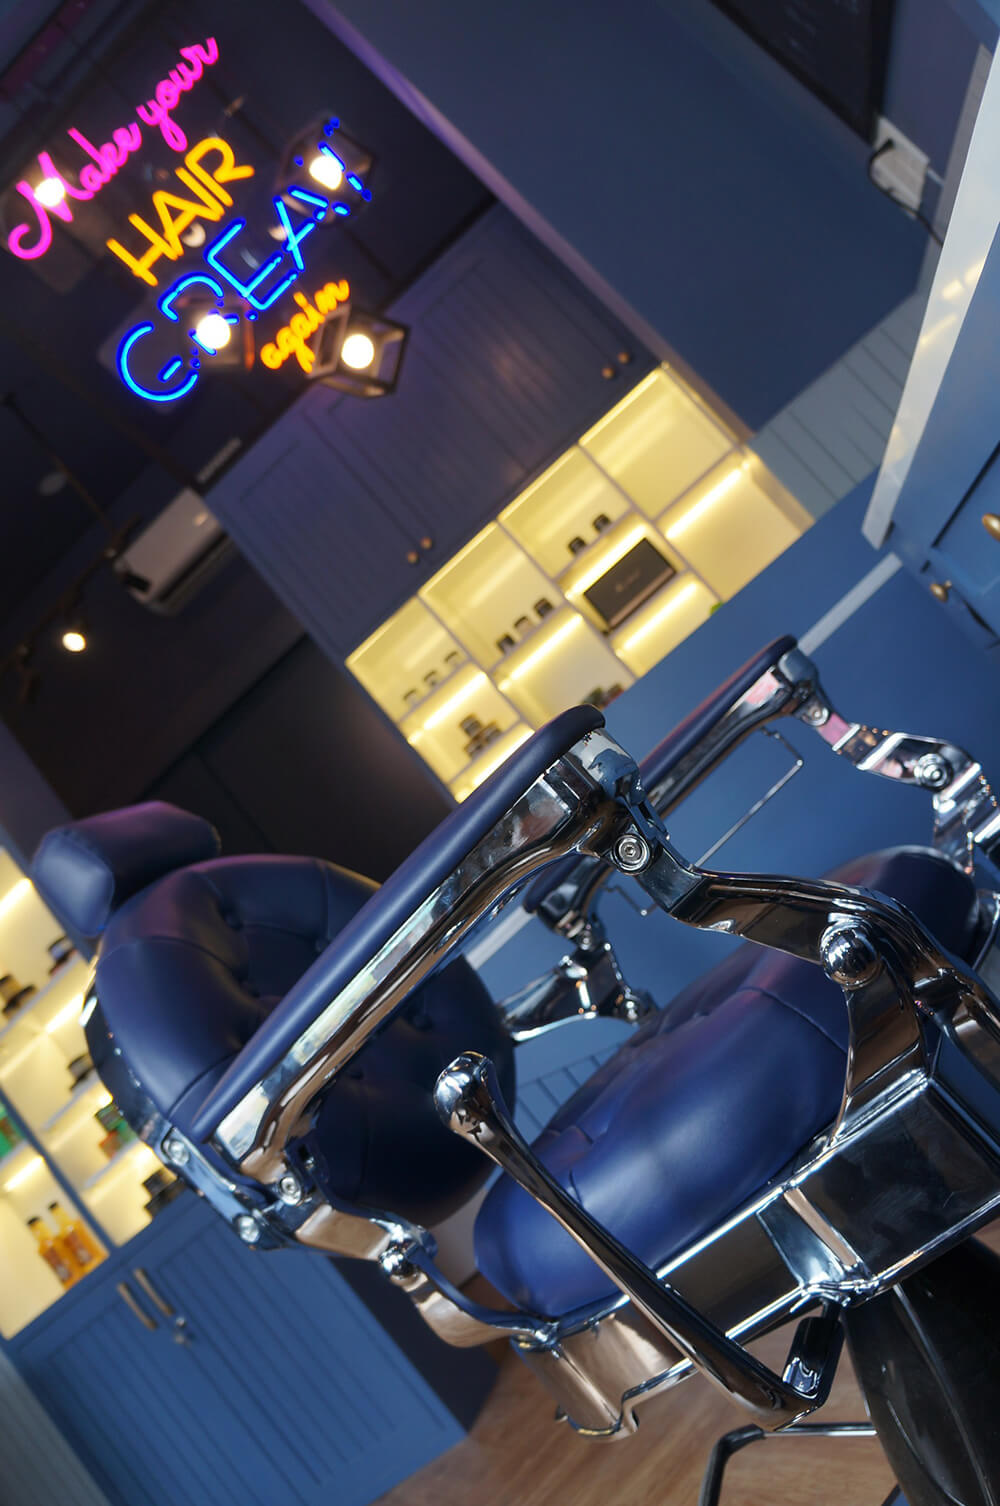 HẺM barber shop Quận Tân Phú - Tp.HCM